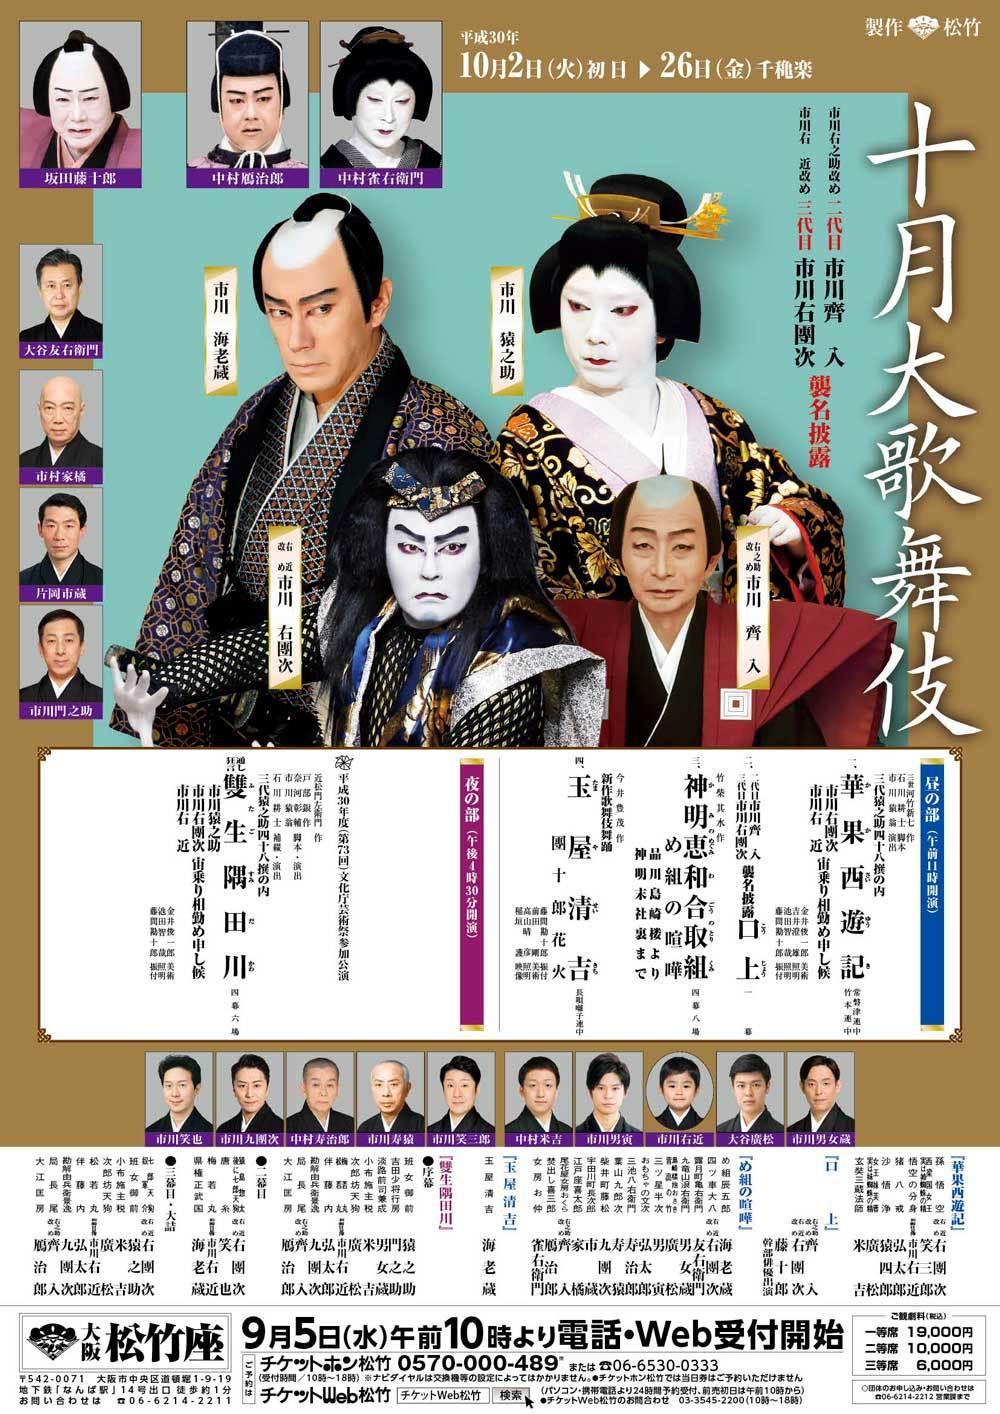 syouchikuza2018_10_01.jpg